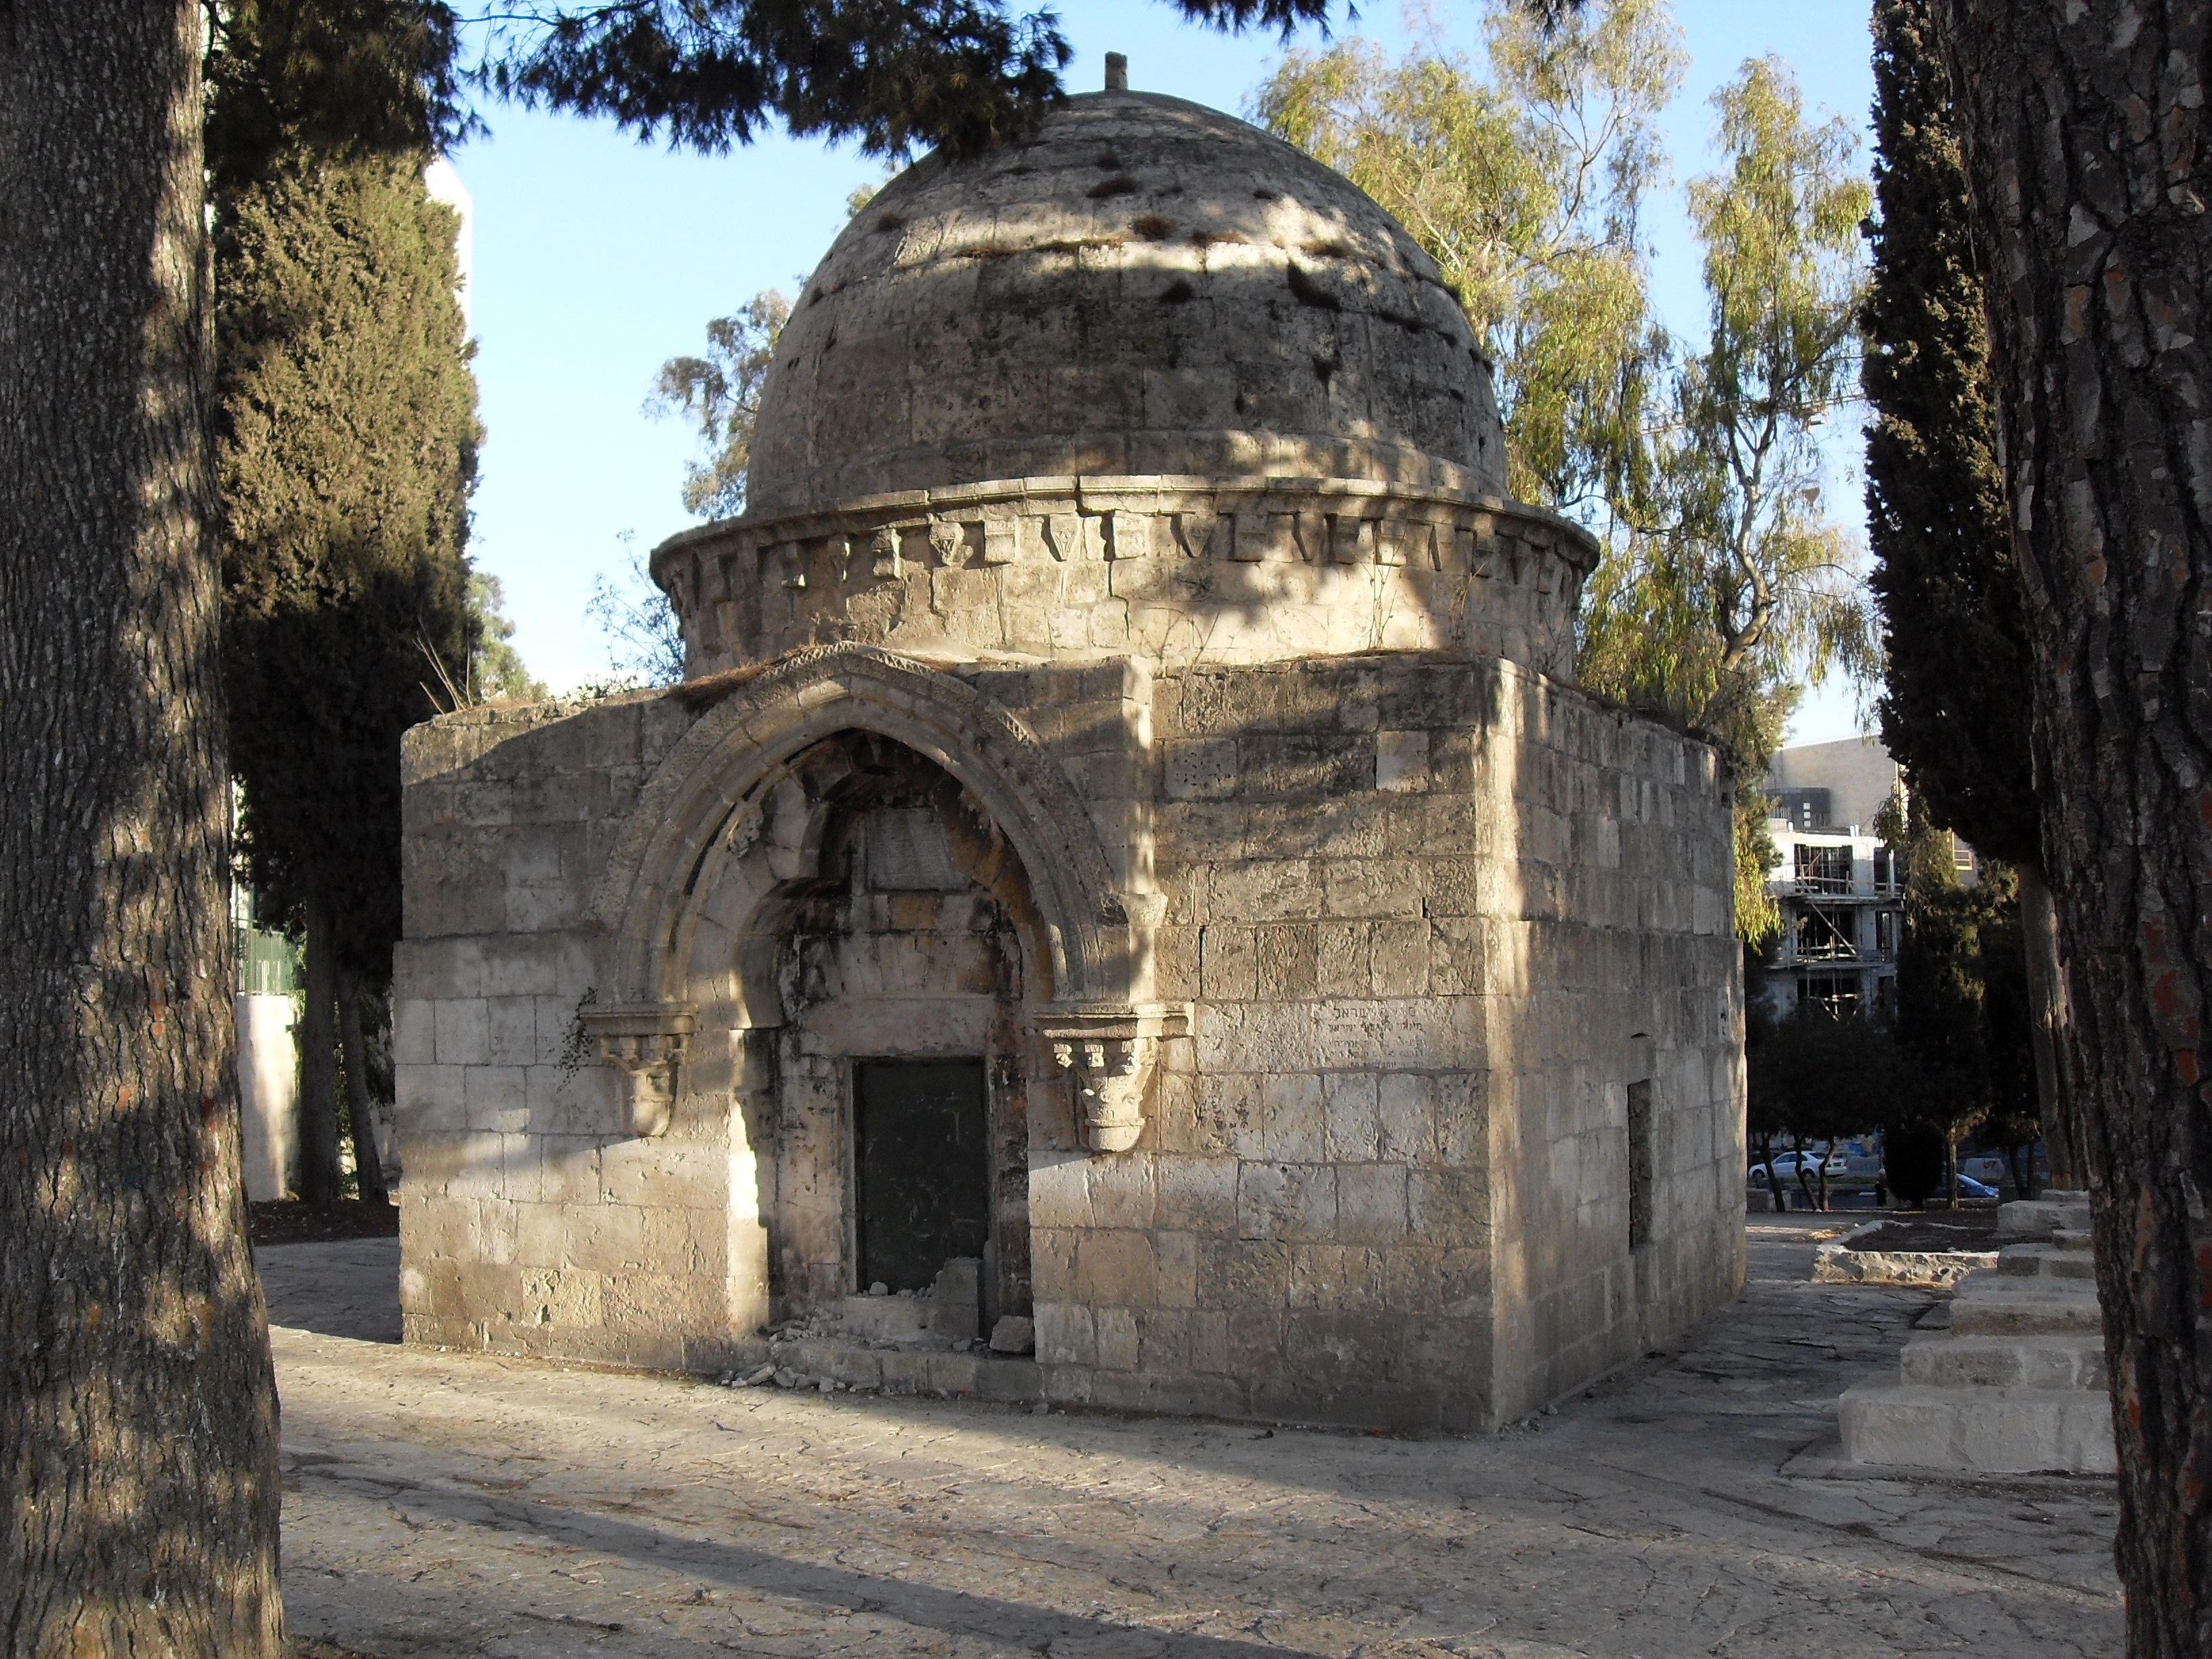 UNESCO Supports Simon Wiesenthal Center's Destruction of Historic Muslim Cemetery in Jerusalem